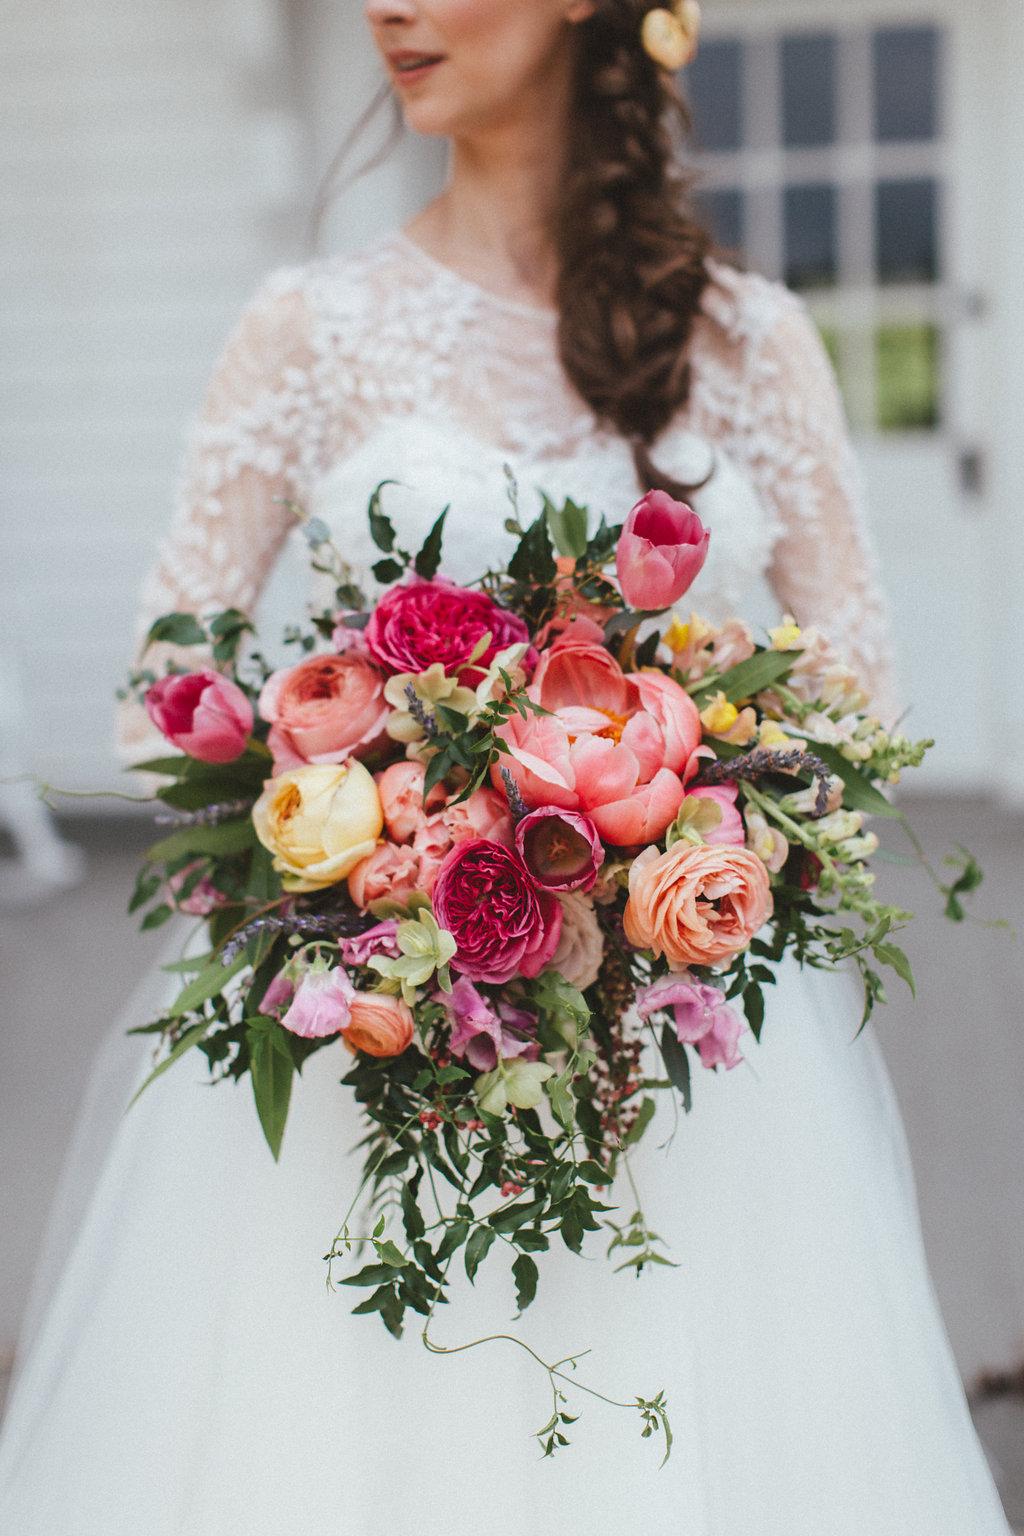 Online course for home-based floral designers // Juniper Made